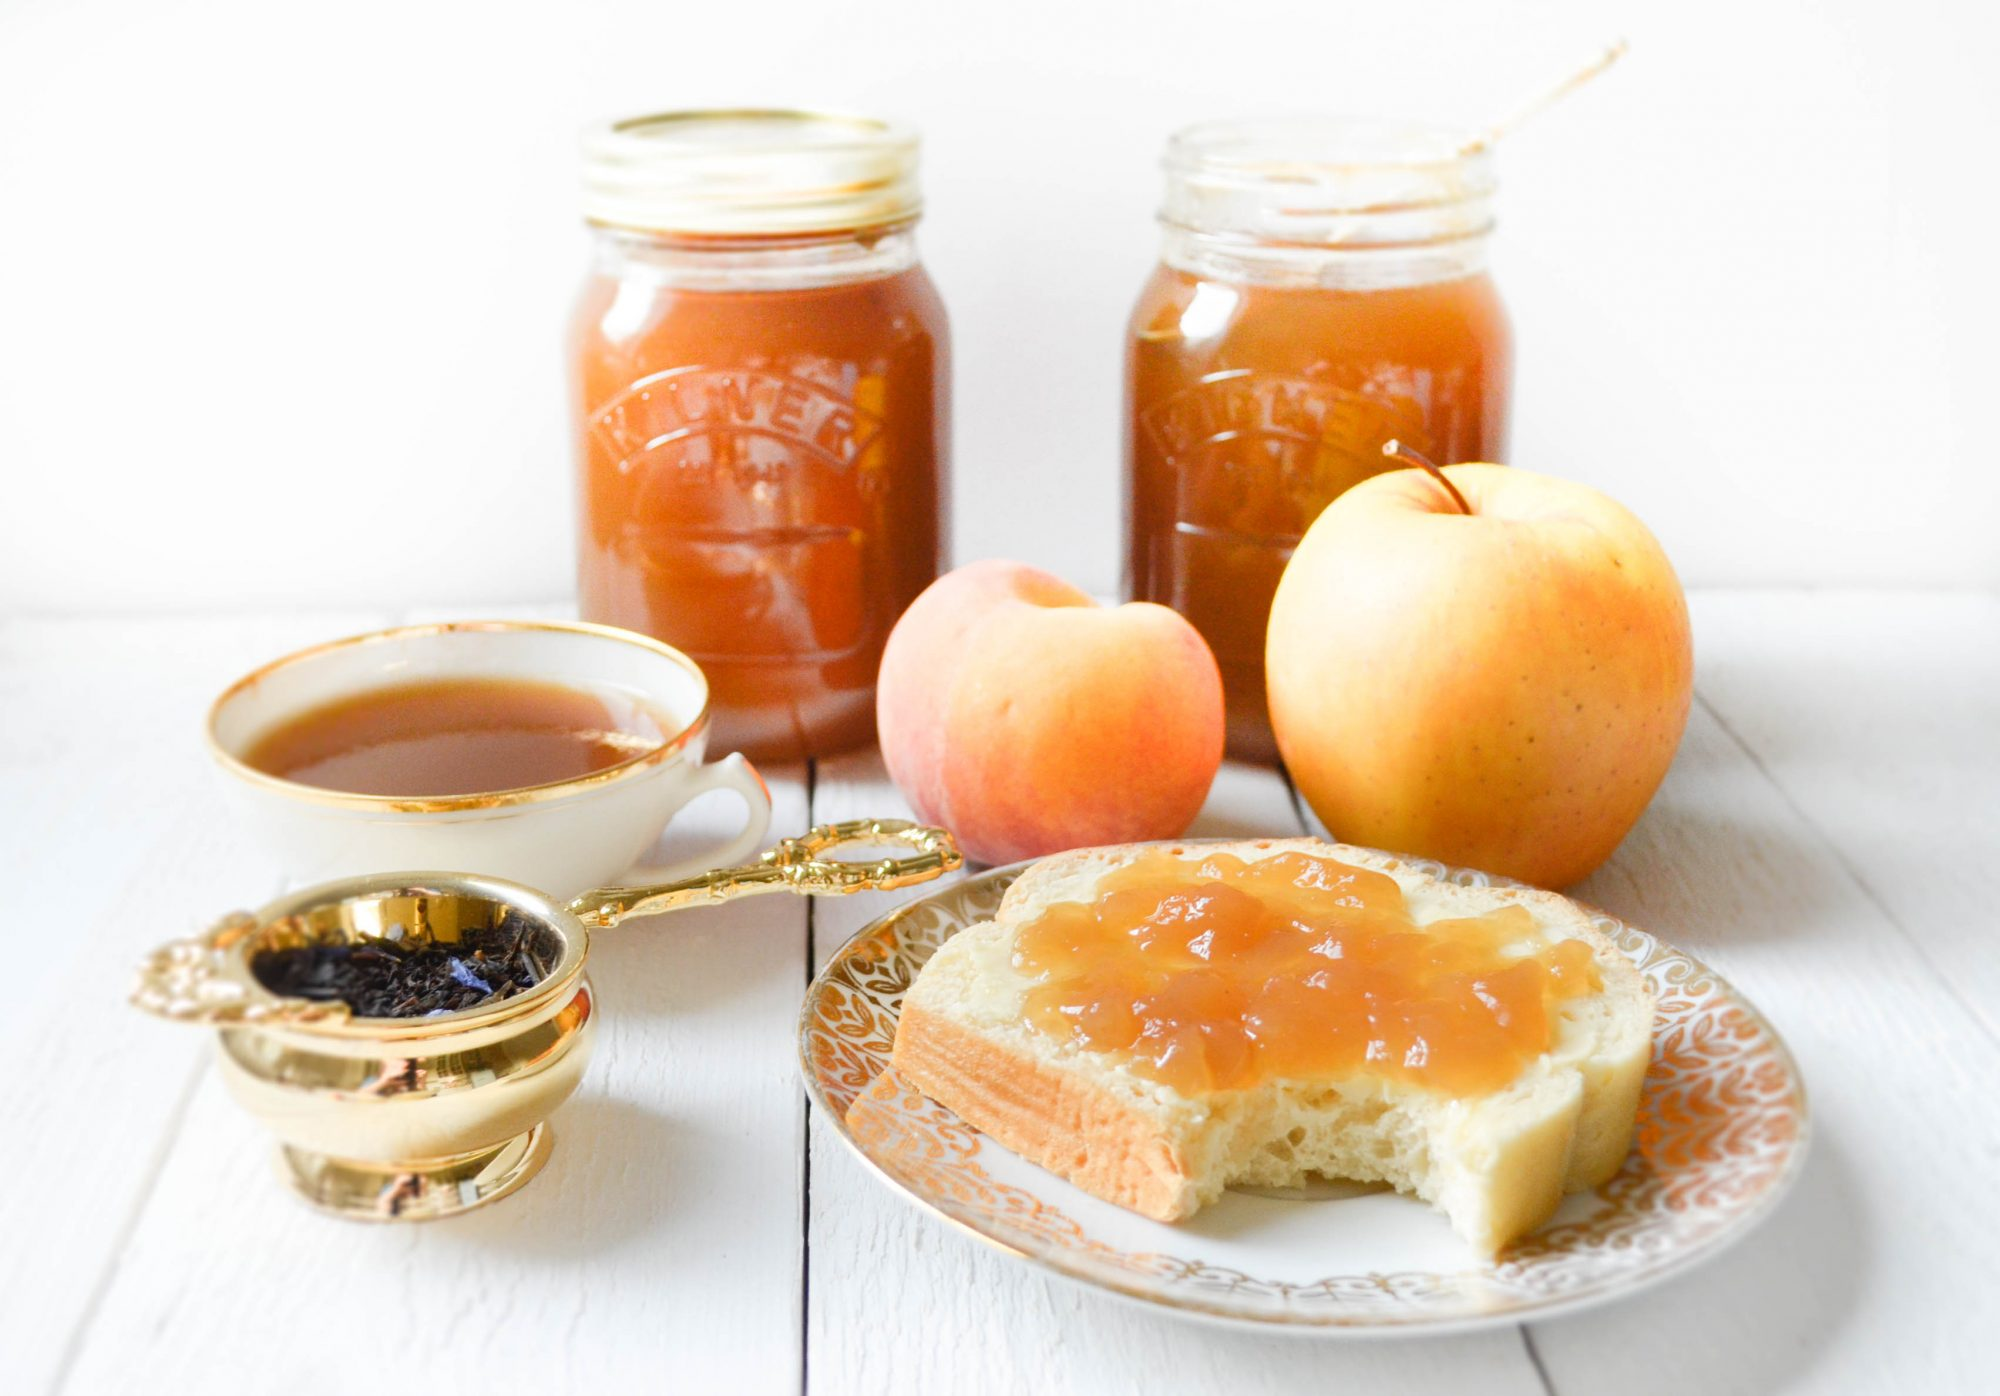 gellee de the afternoon earl grey agar agar pomme peche whittard mason kilner jar bergamote